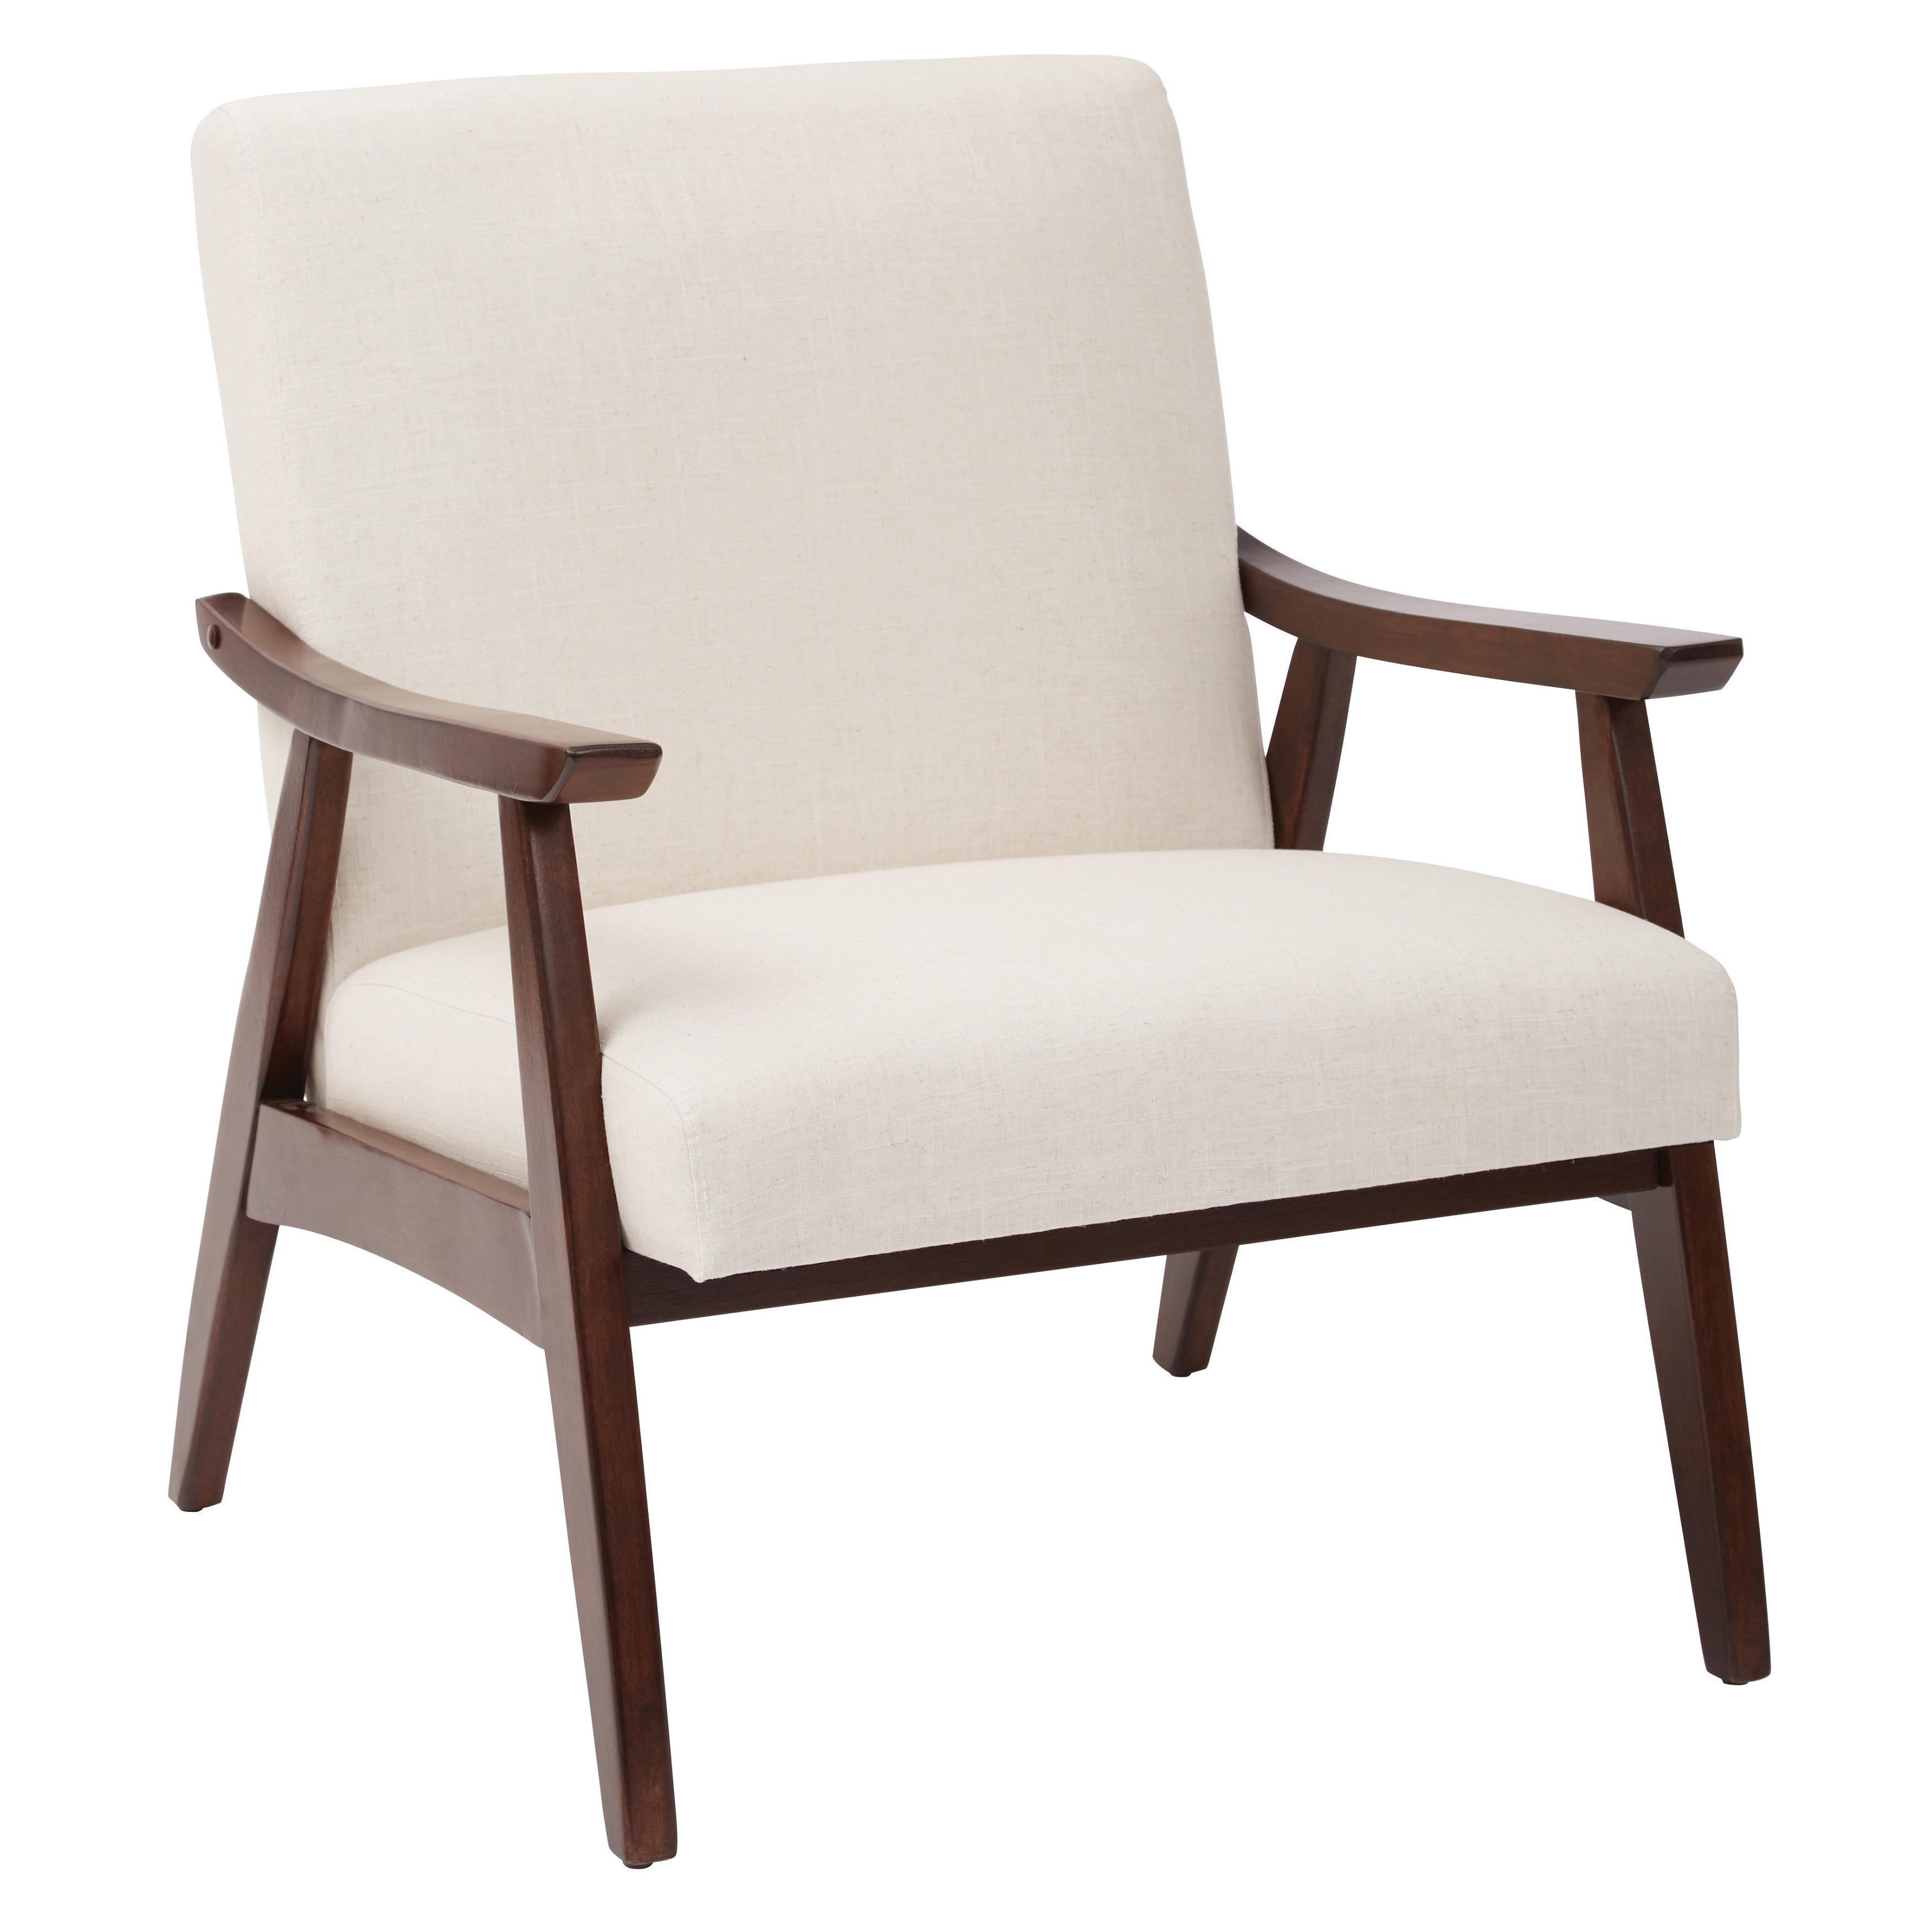 Overstock Arm Chair How To Make A Wooden Carson Carrington Karkkila Mid Century Free Shipping Today Com 18682070